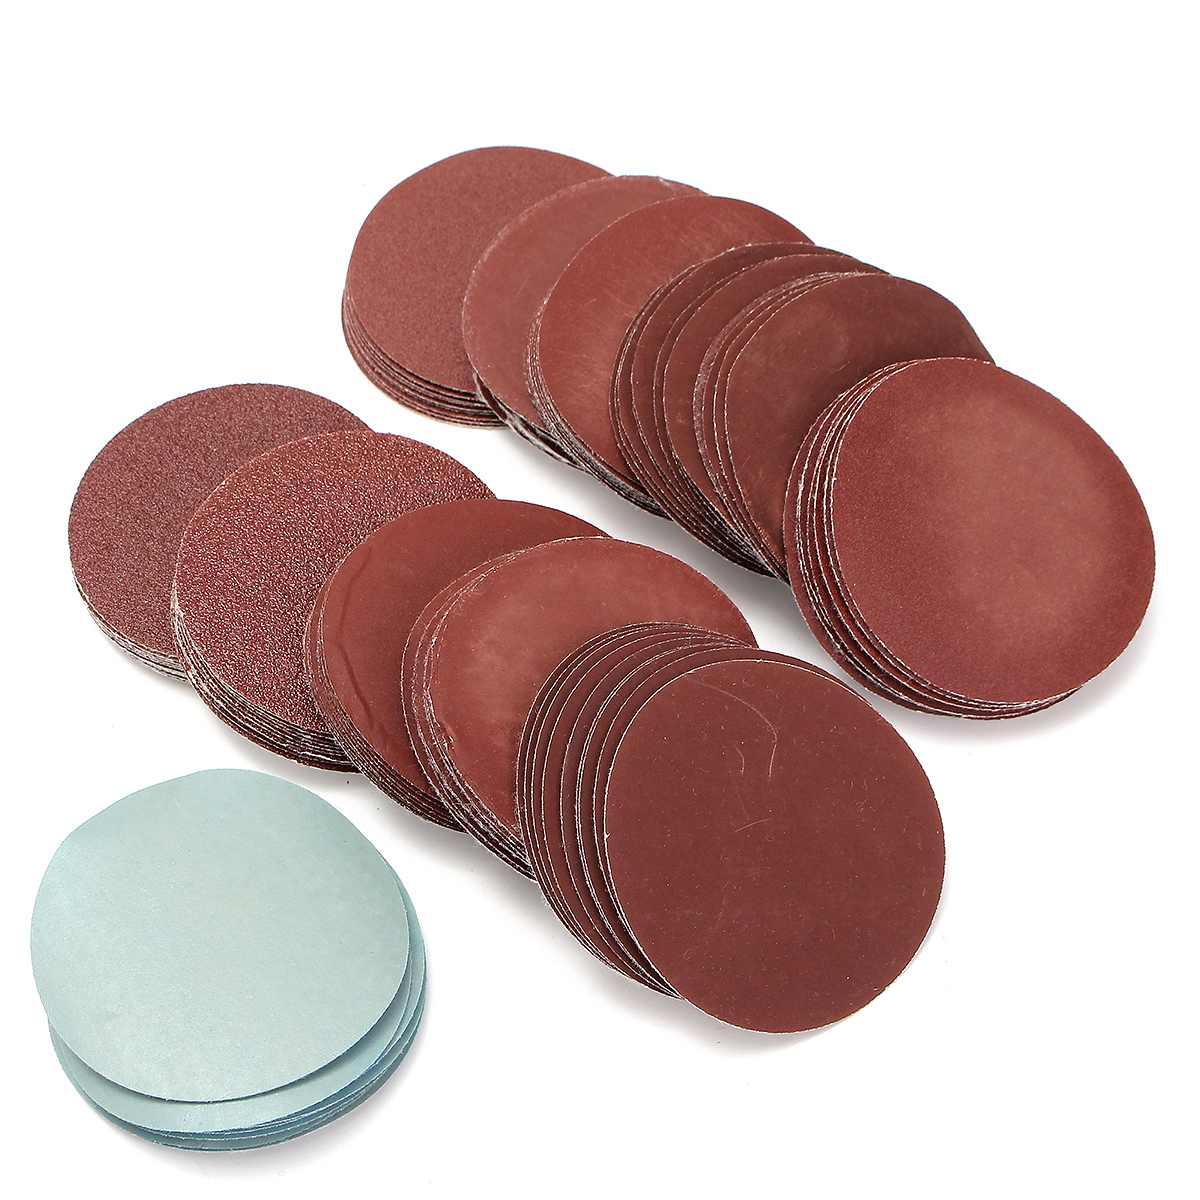 100pcs Sanding Disc Sandpaper Kit 3Inch 75mm 80 To 3000 Grit Abrasives  For General Polishing Buffing Discs Sandpaper